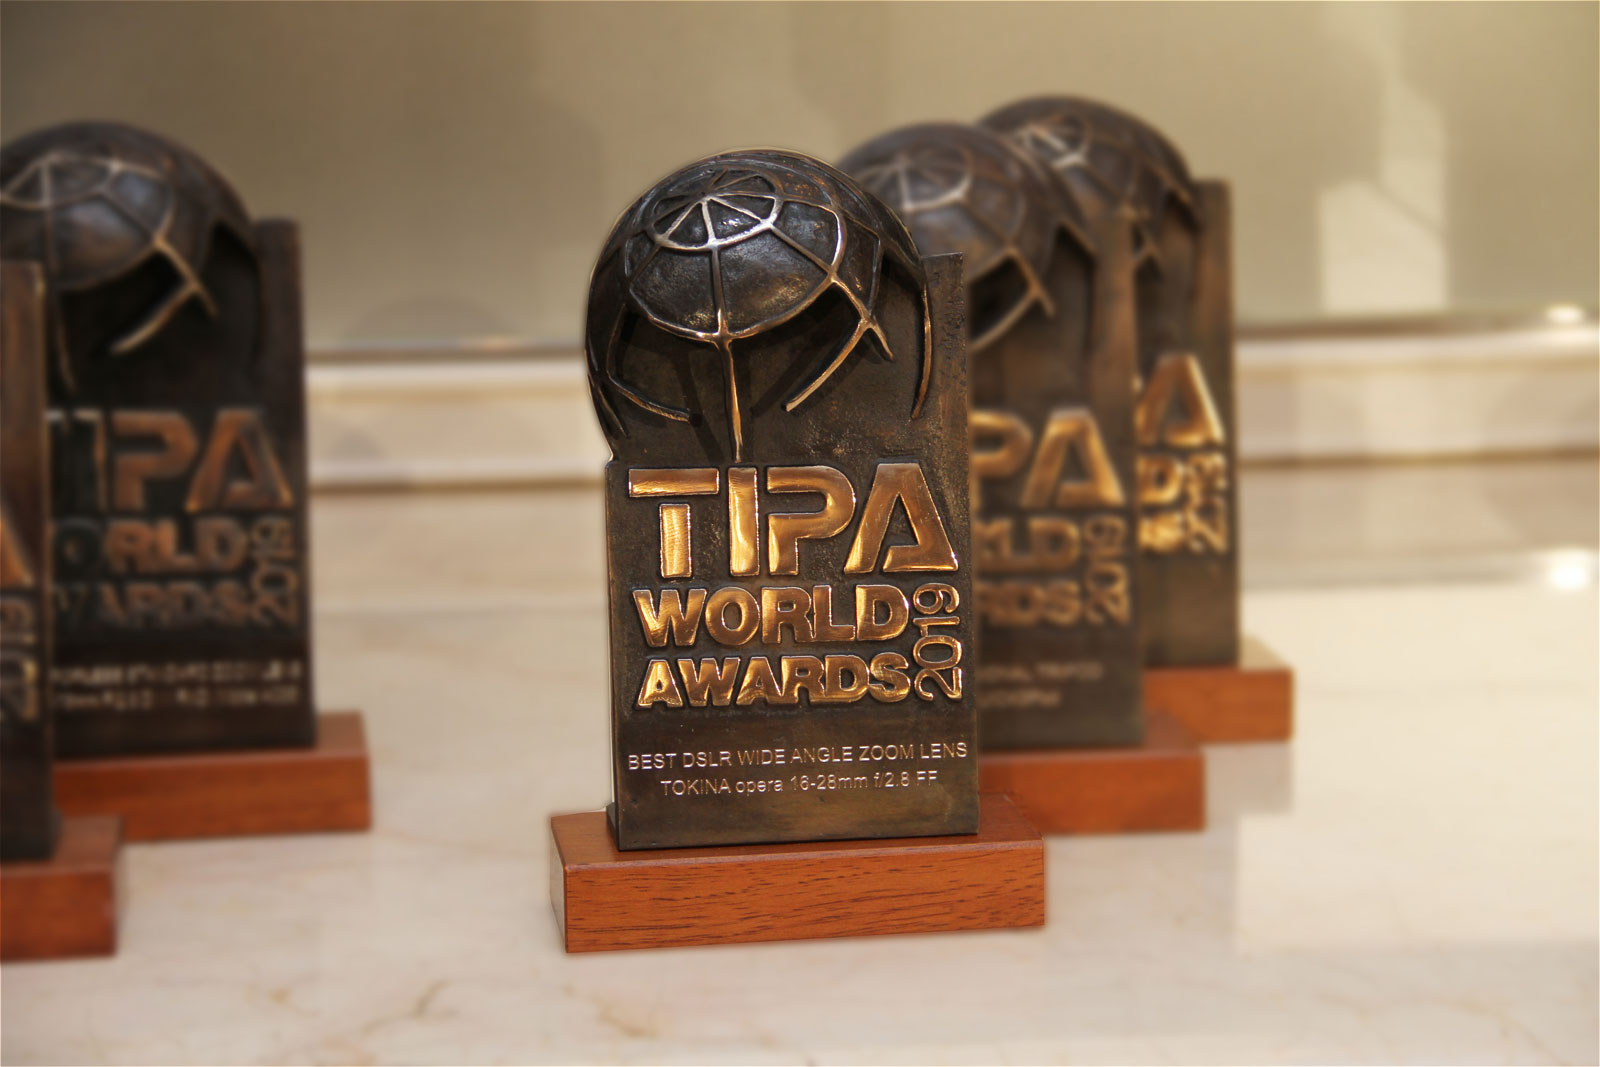 Tokina - Receiving TIPA World Award for opera 16-28mm F2 8 FF as the